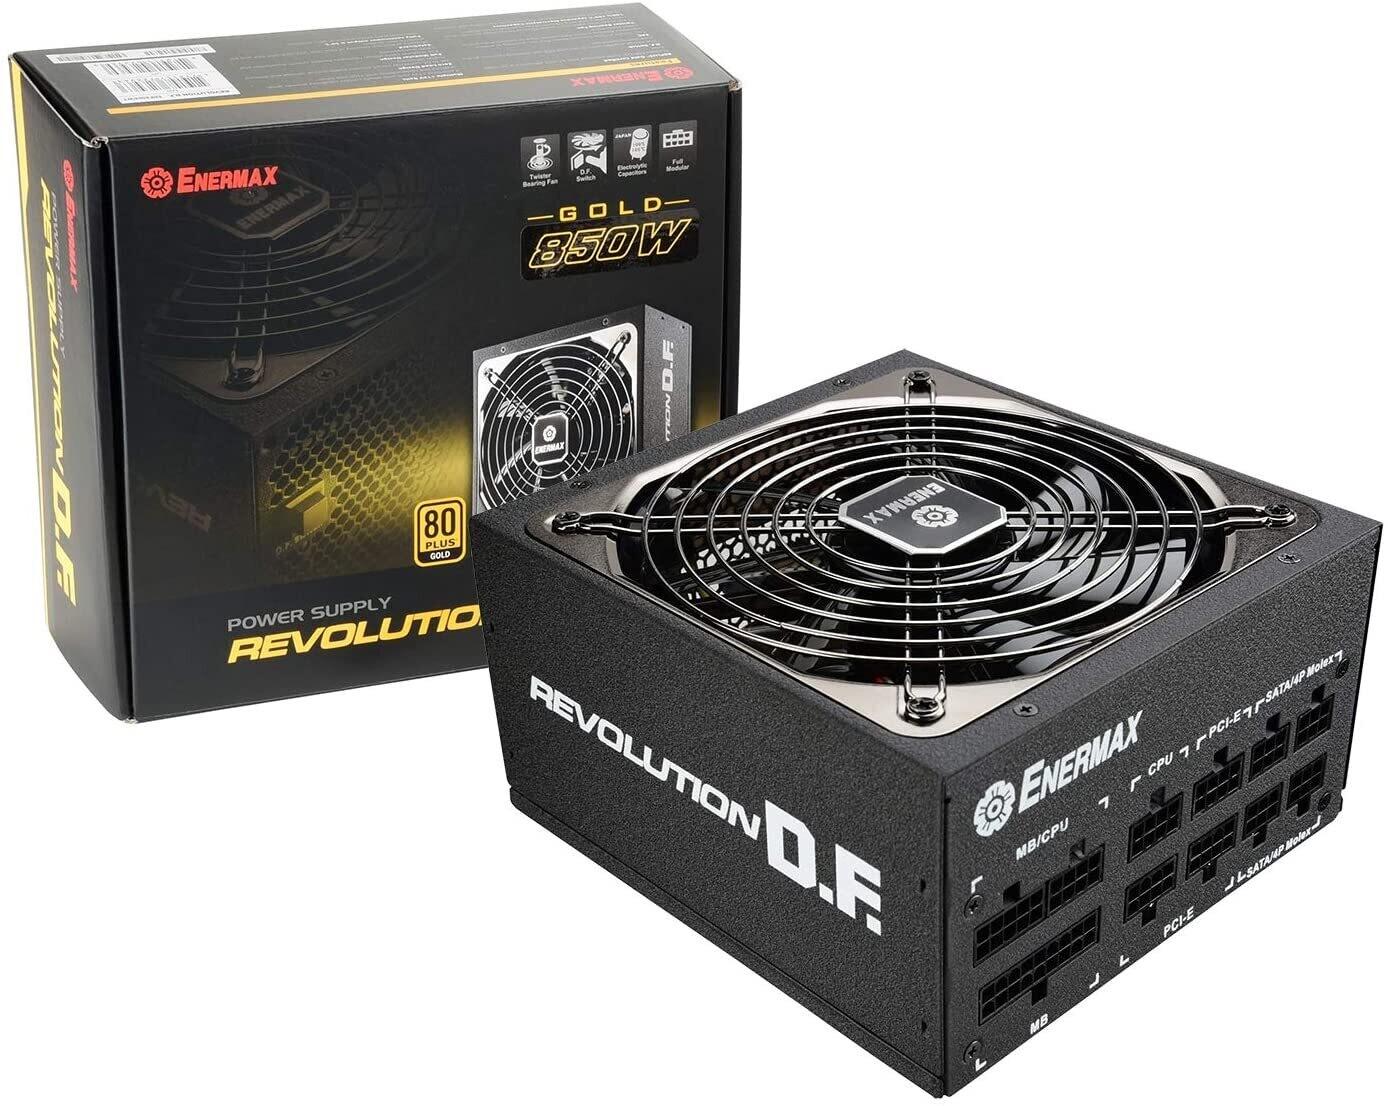 Enermax Revolution DF ERF850EWT 80+ Gold 850W, Full-Modular Power Supply - 7 Year Warranty - *Online-only price!*